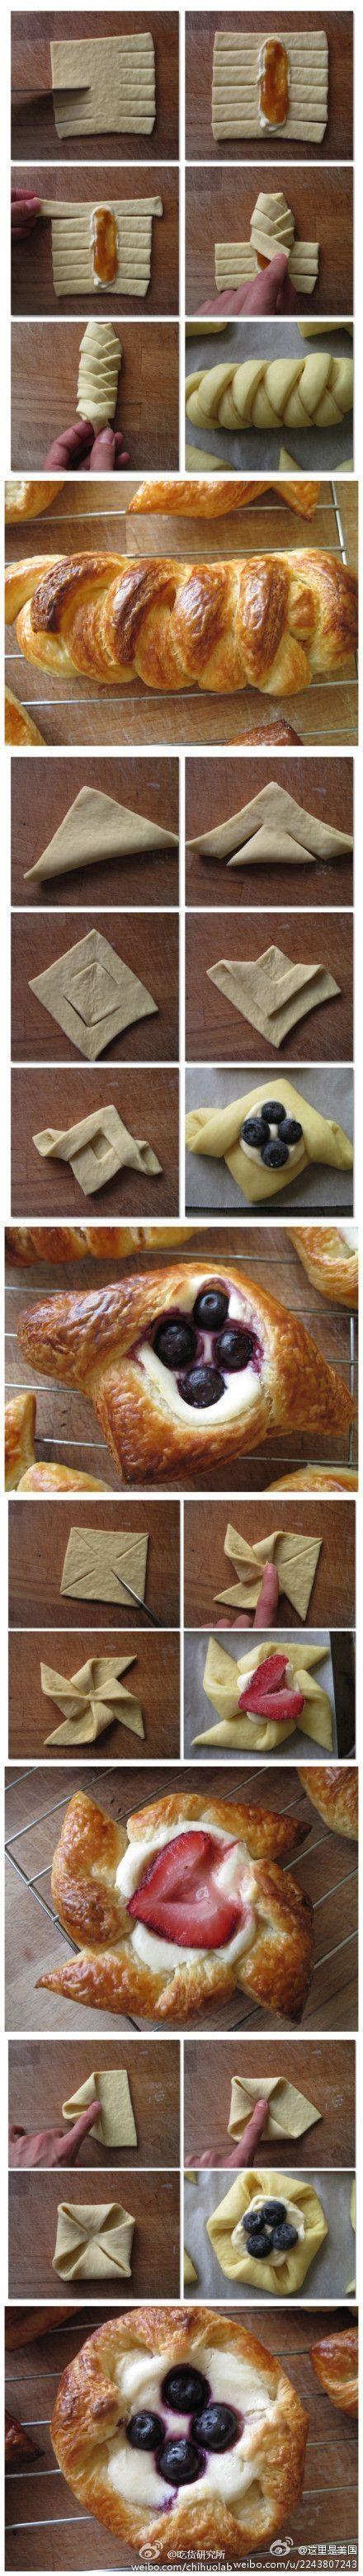 Yummo! Pastries... #pastries by mirela-anna